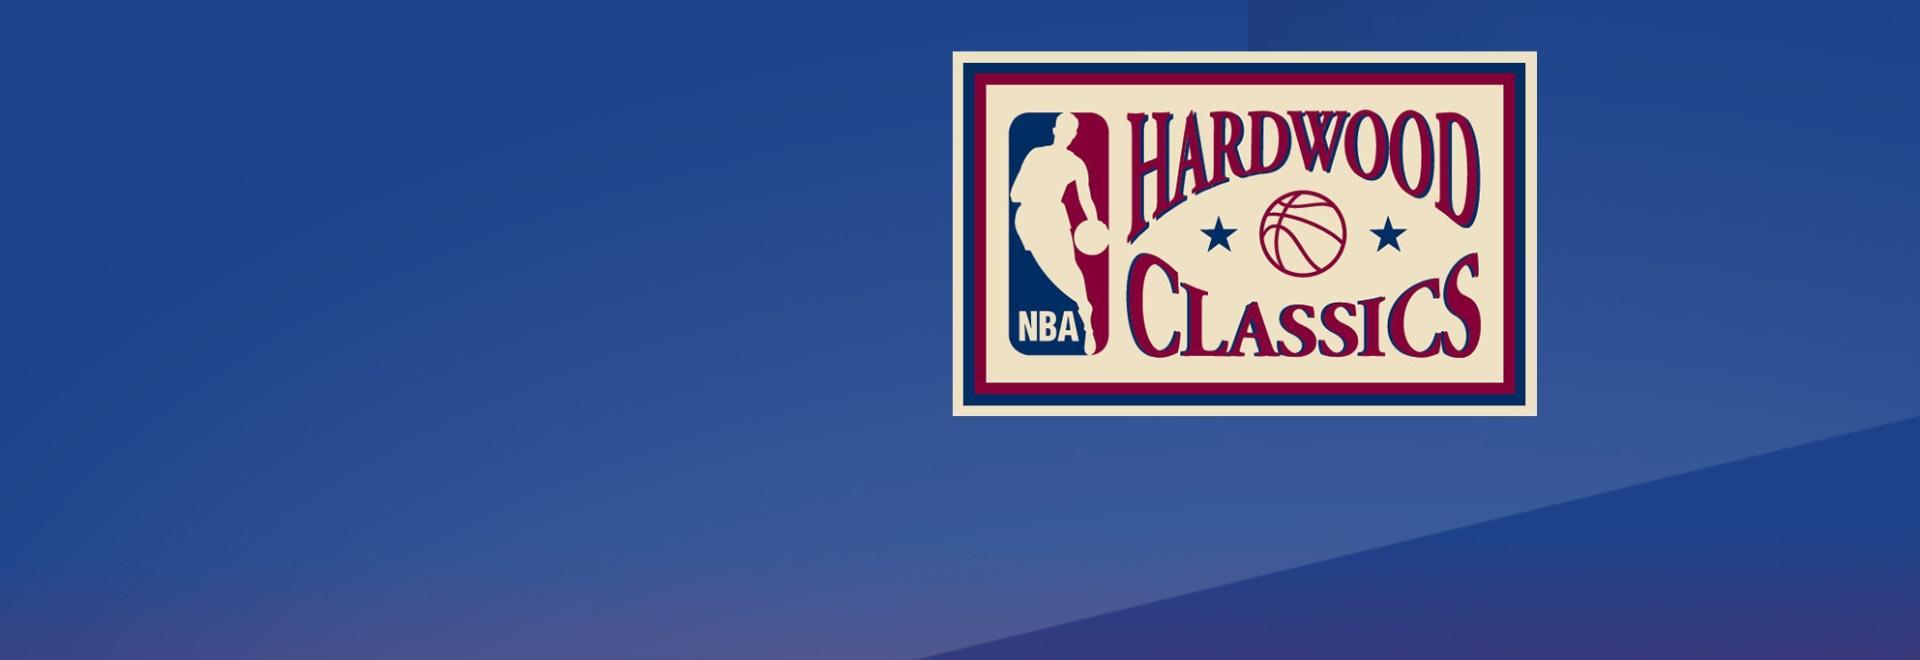 Celtics - Pistons 25/03/95